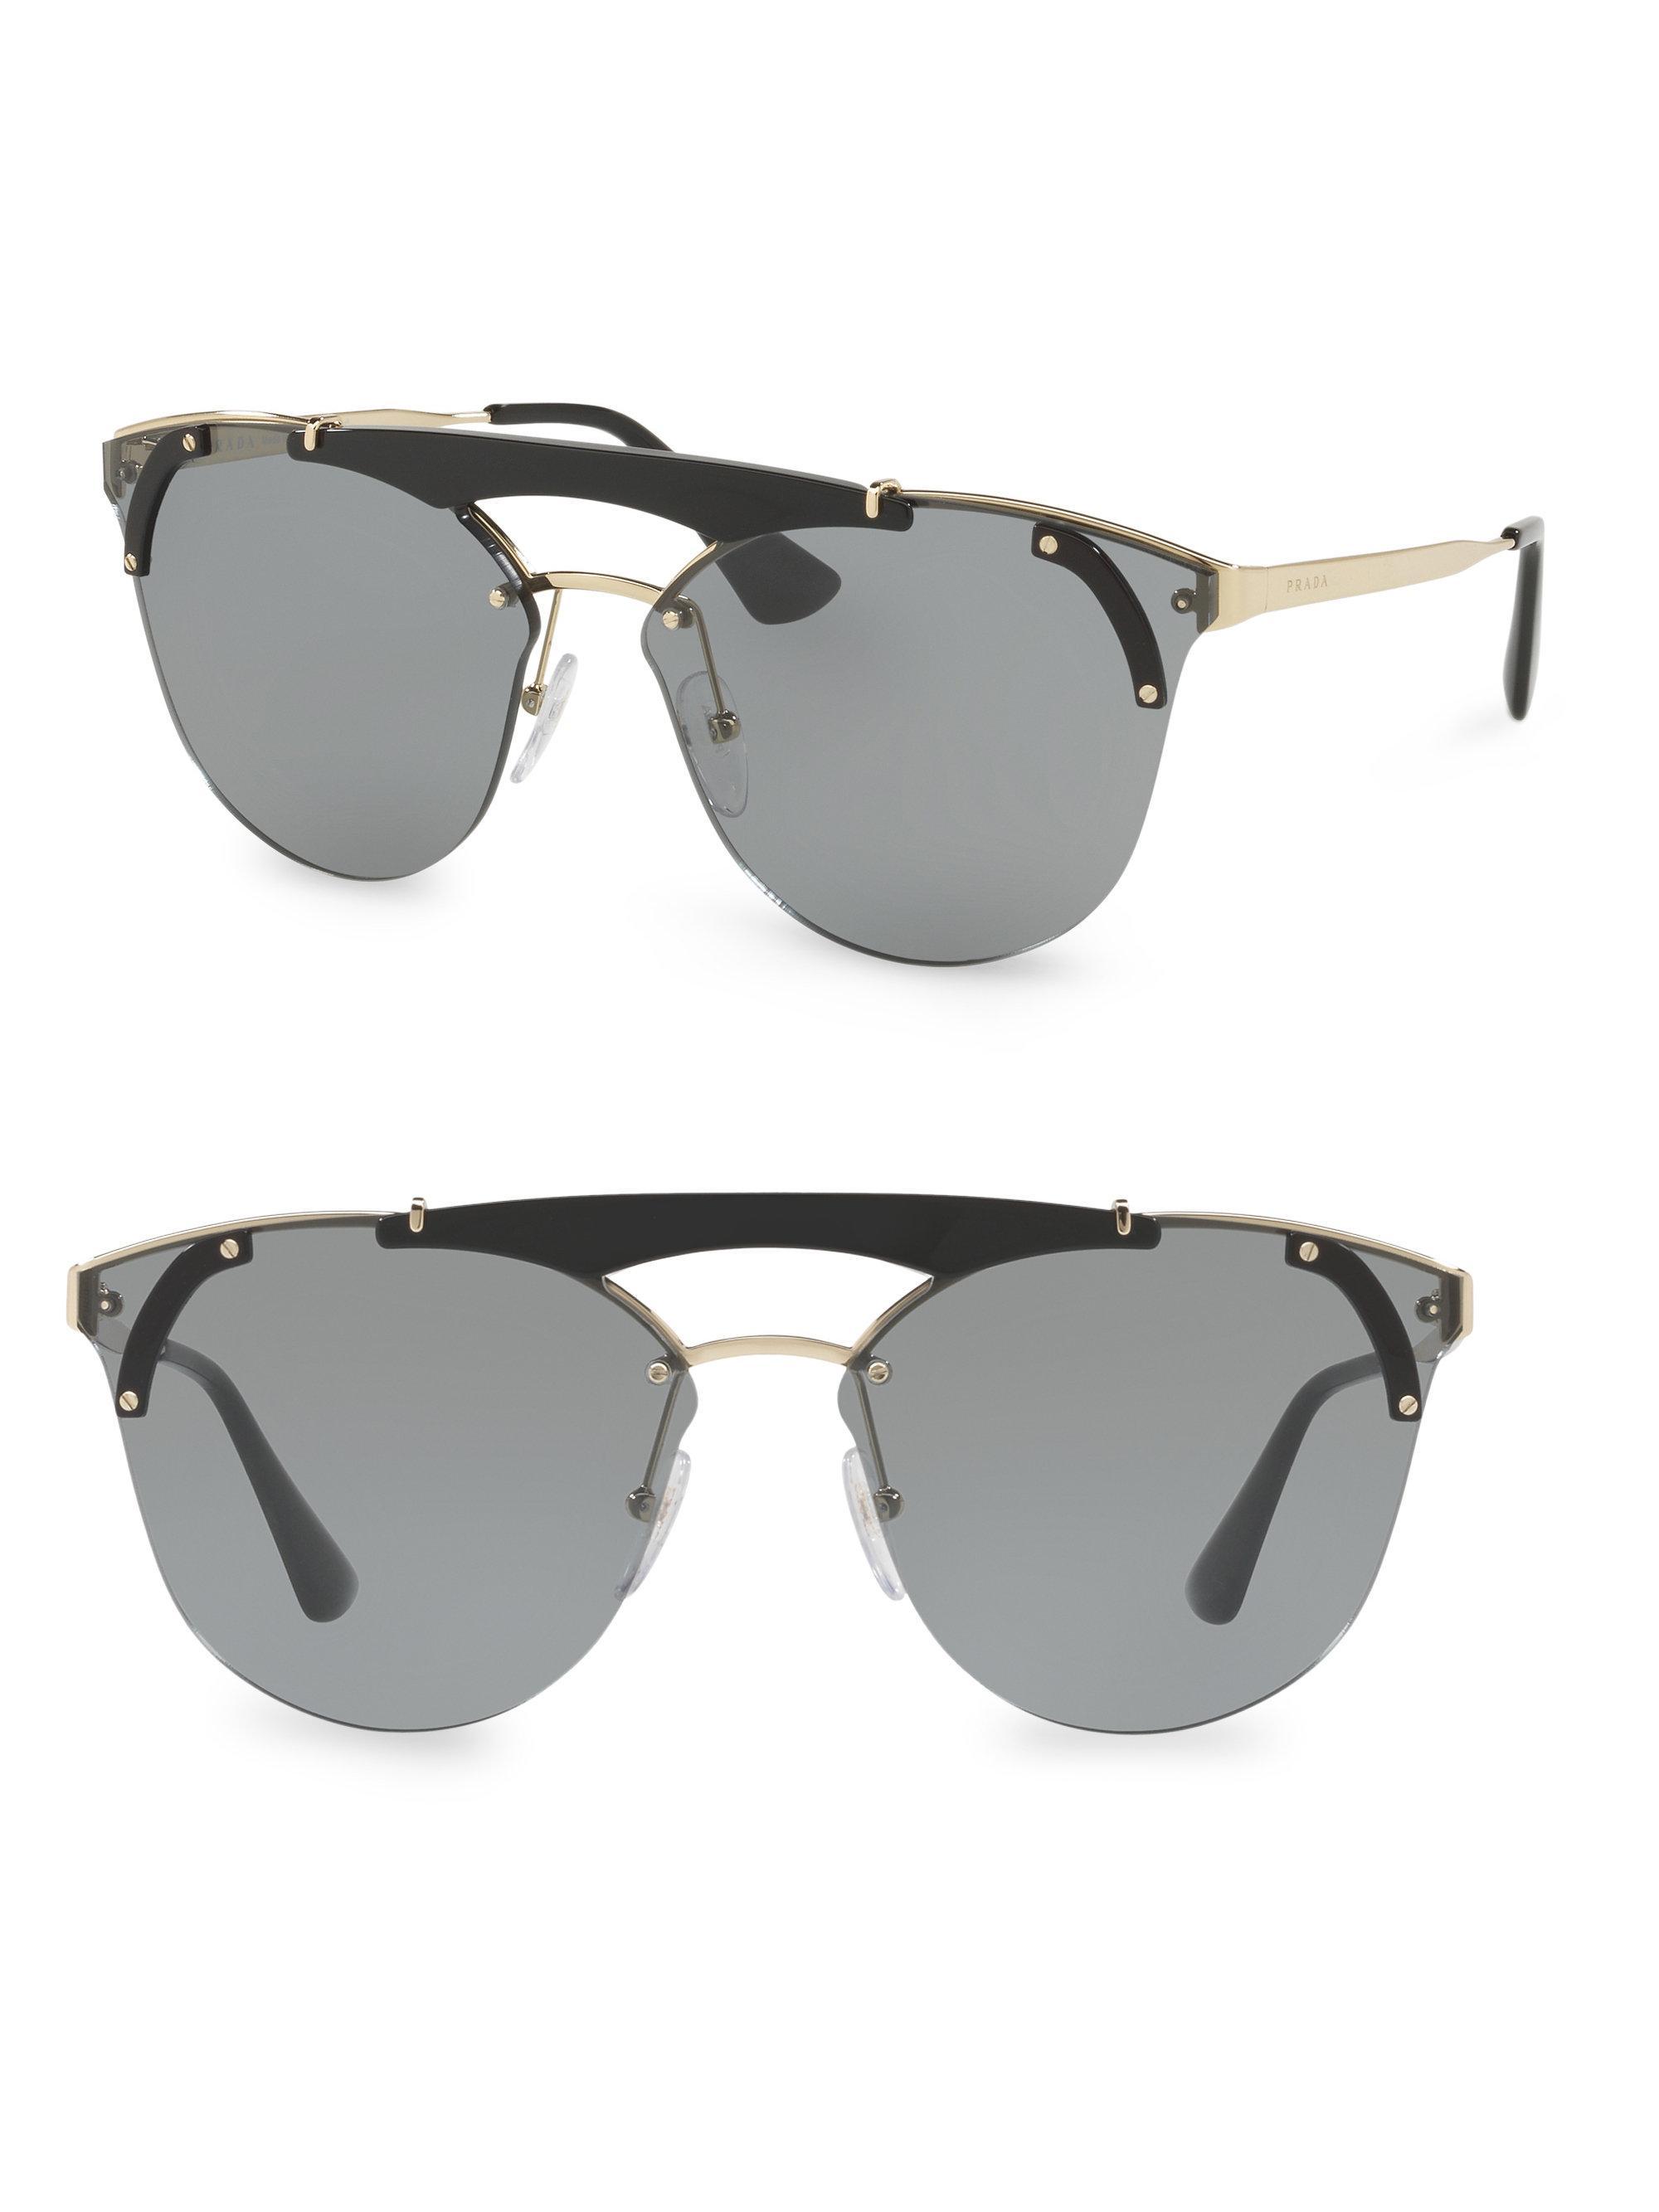 4d37ed39f26 Lyst - Prada Deconstructed Rimless Sunglasses in Metallic